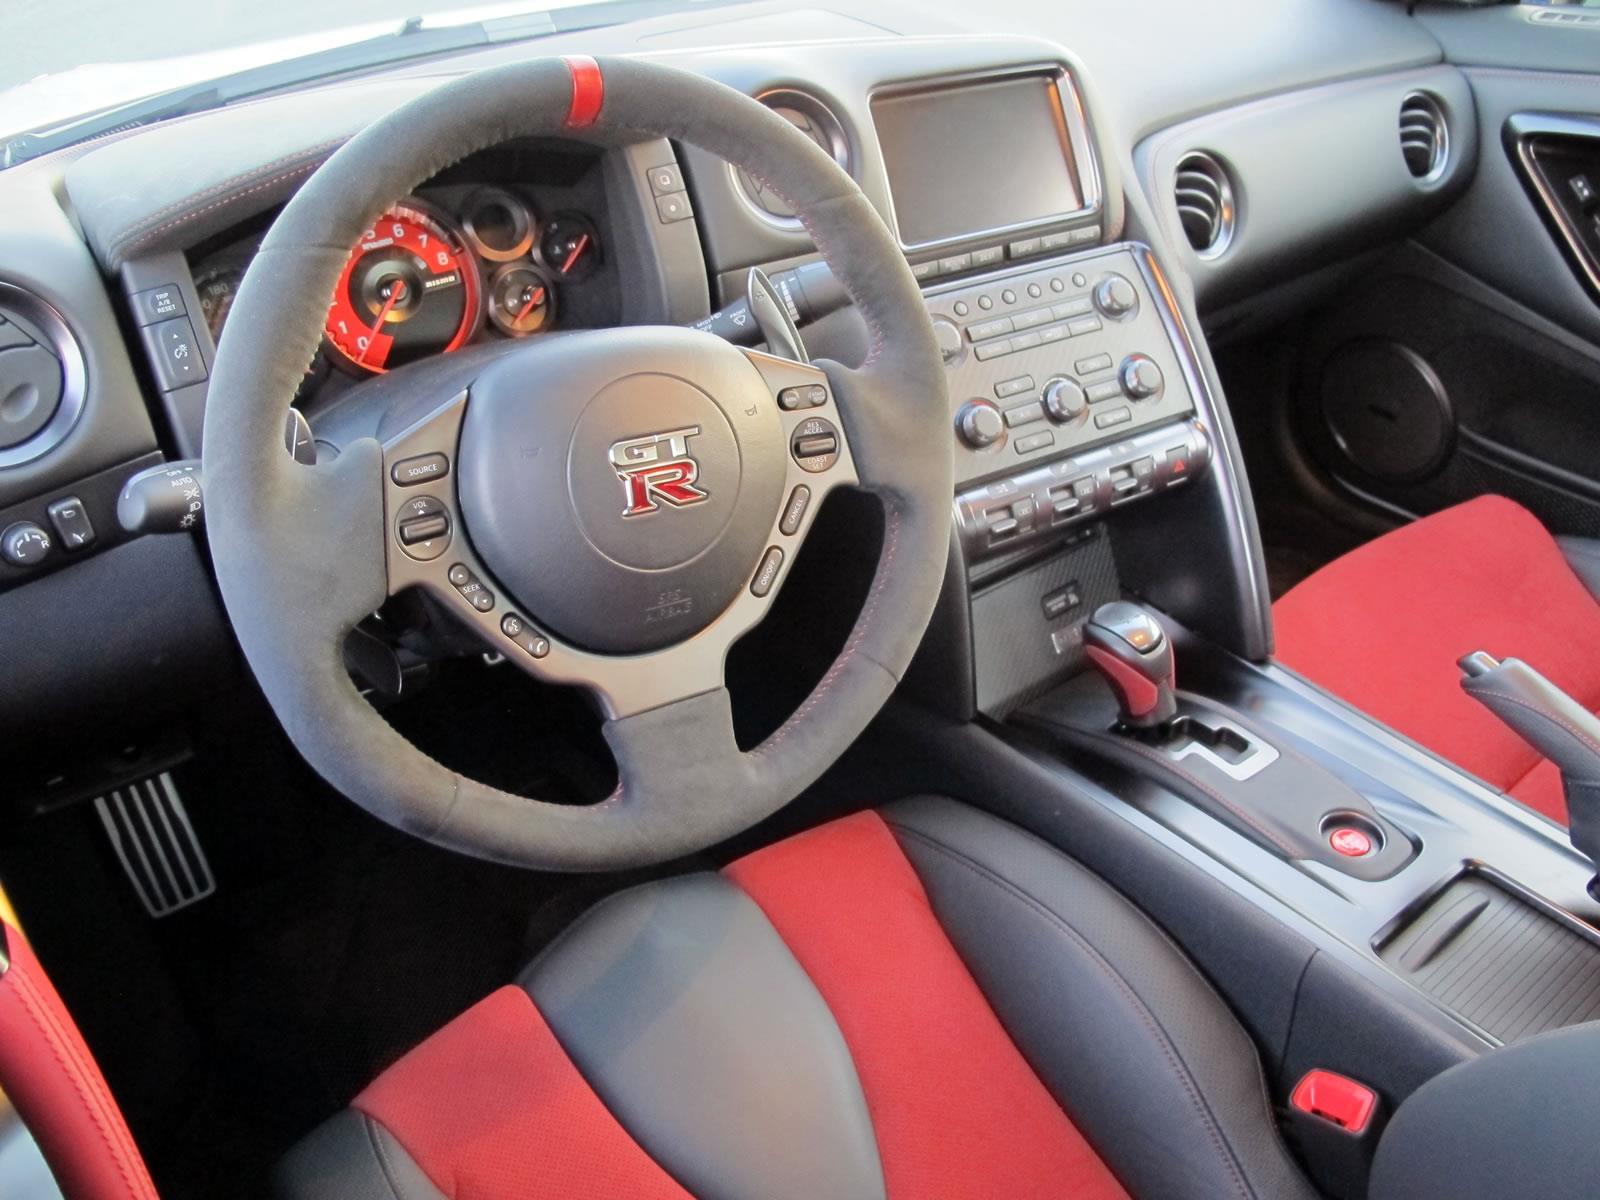 Nissan nissan deportivos nissan gt r nissan gt r r35 tuning cars - Nissan Gt R Nismo 2014 Manejo En Jap N